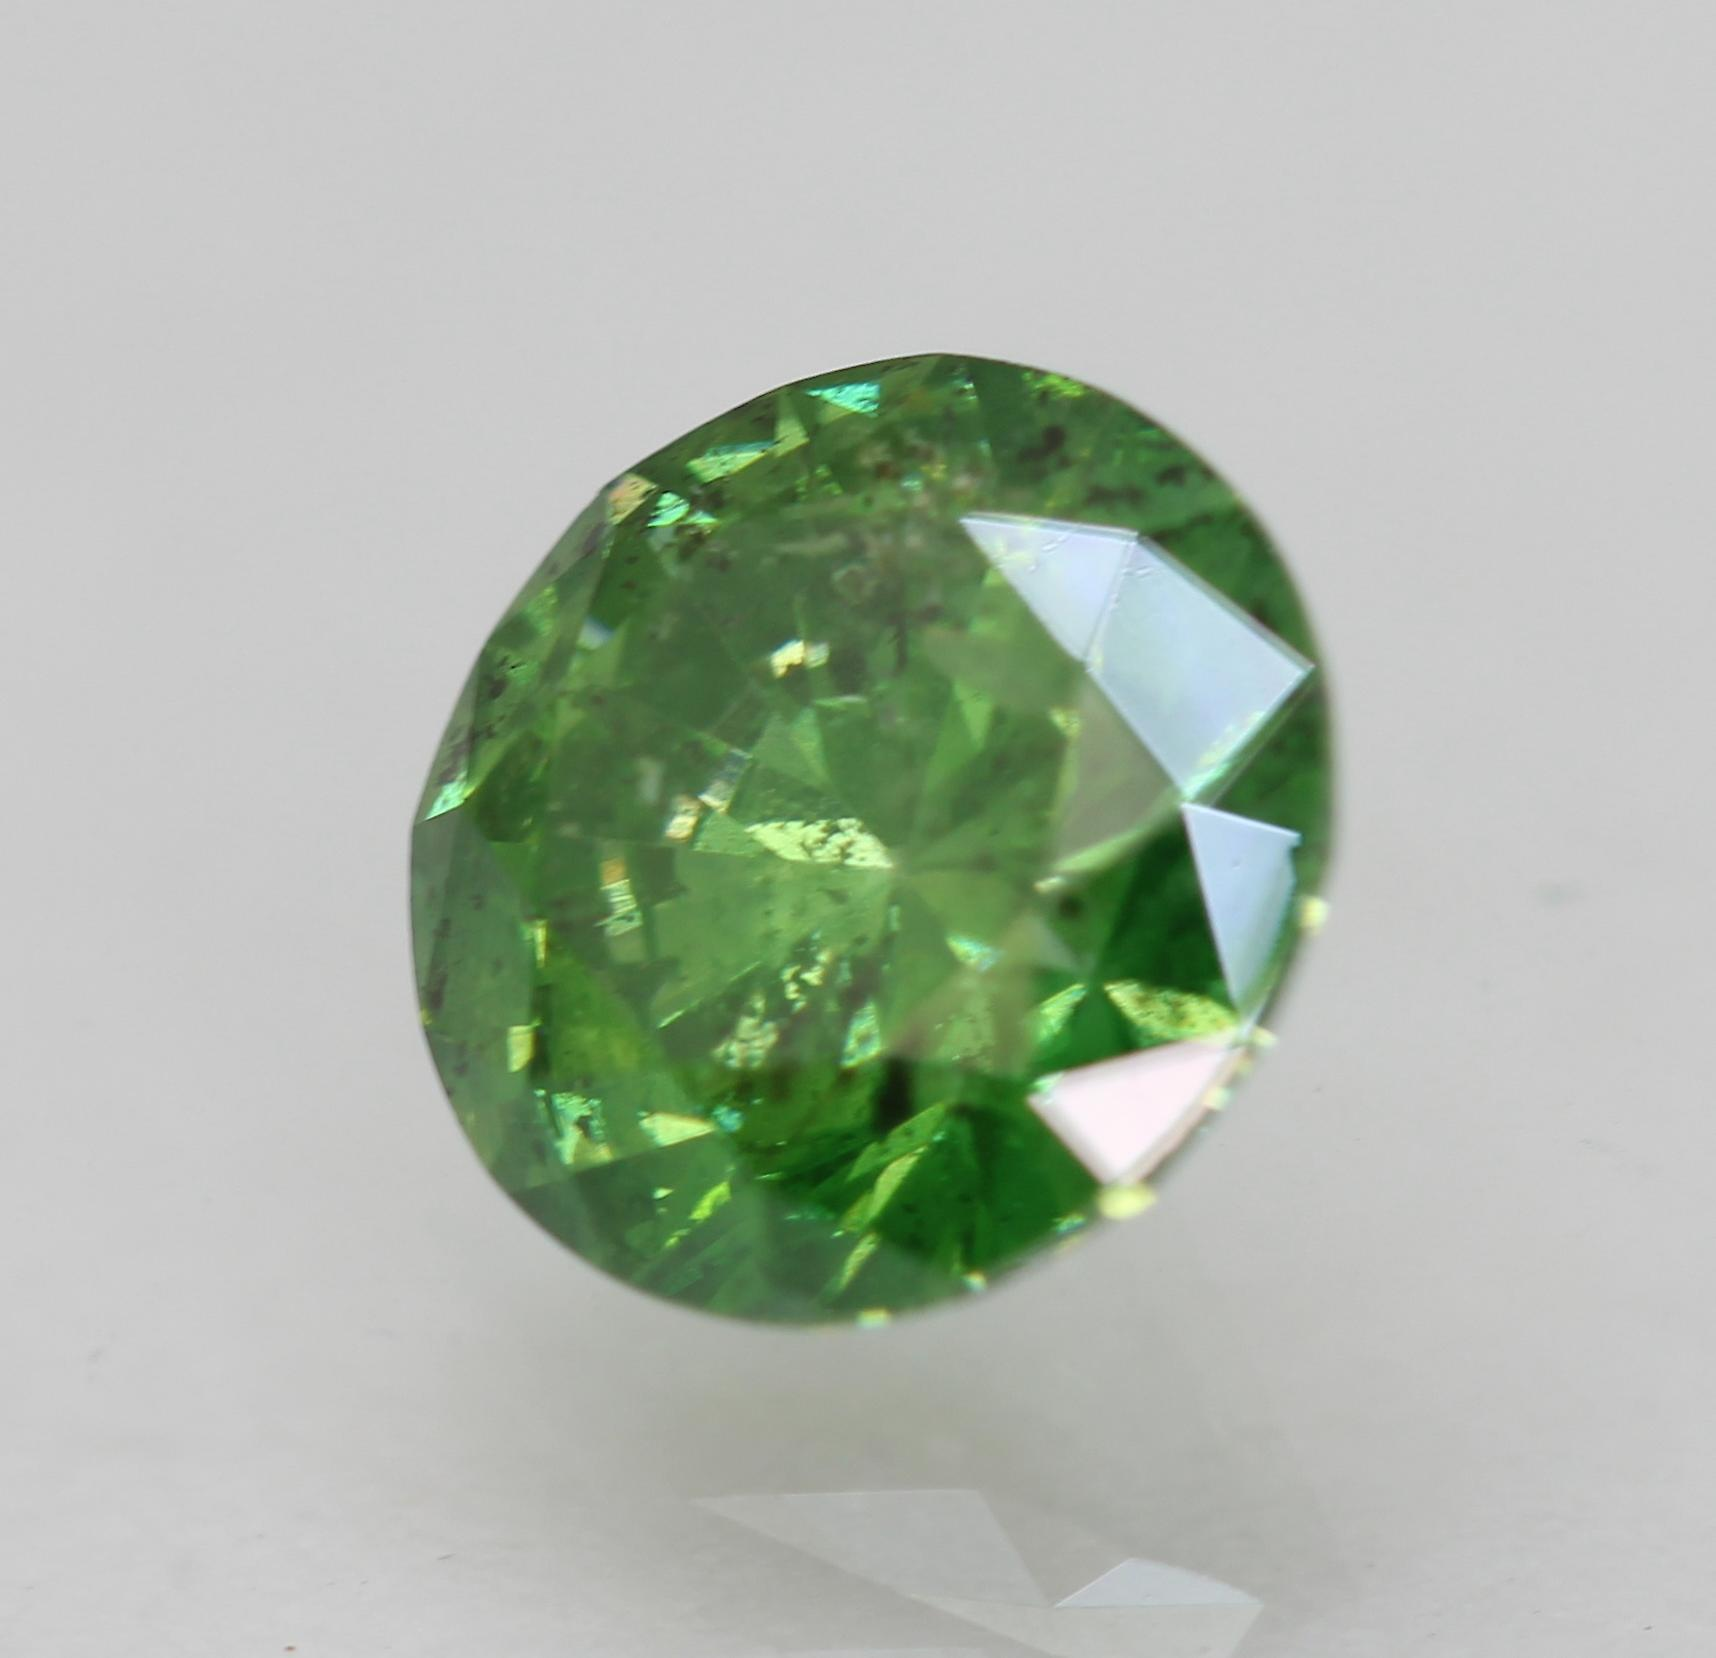 Cert 1.02 Carat Yellow Green SI1 Round Brilliant Enhanced Natural Diamond 6.52mm